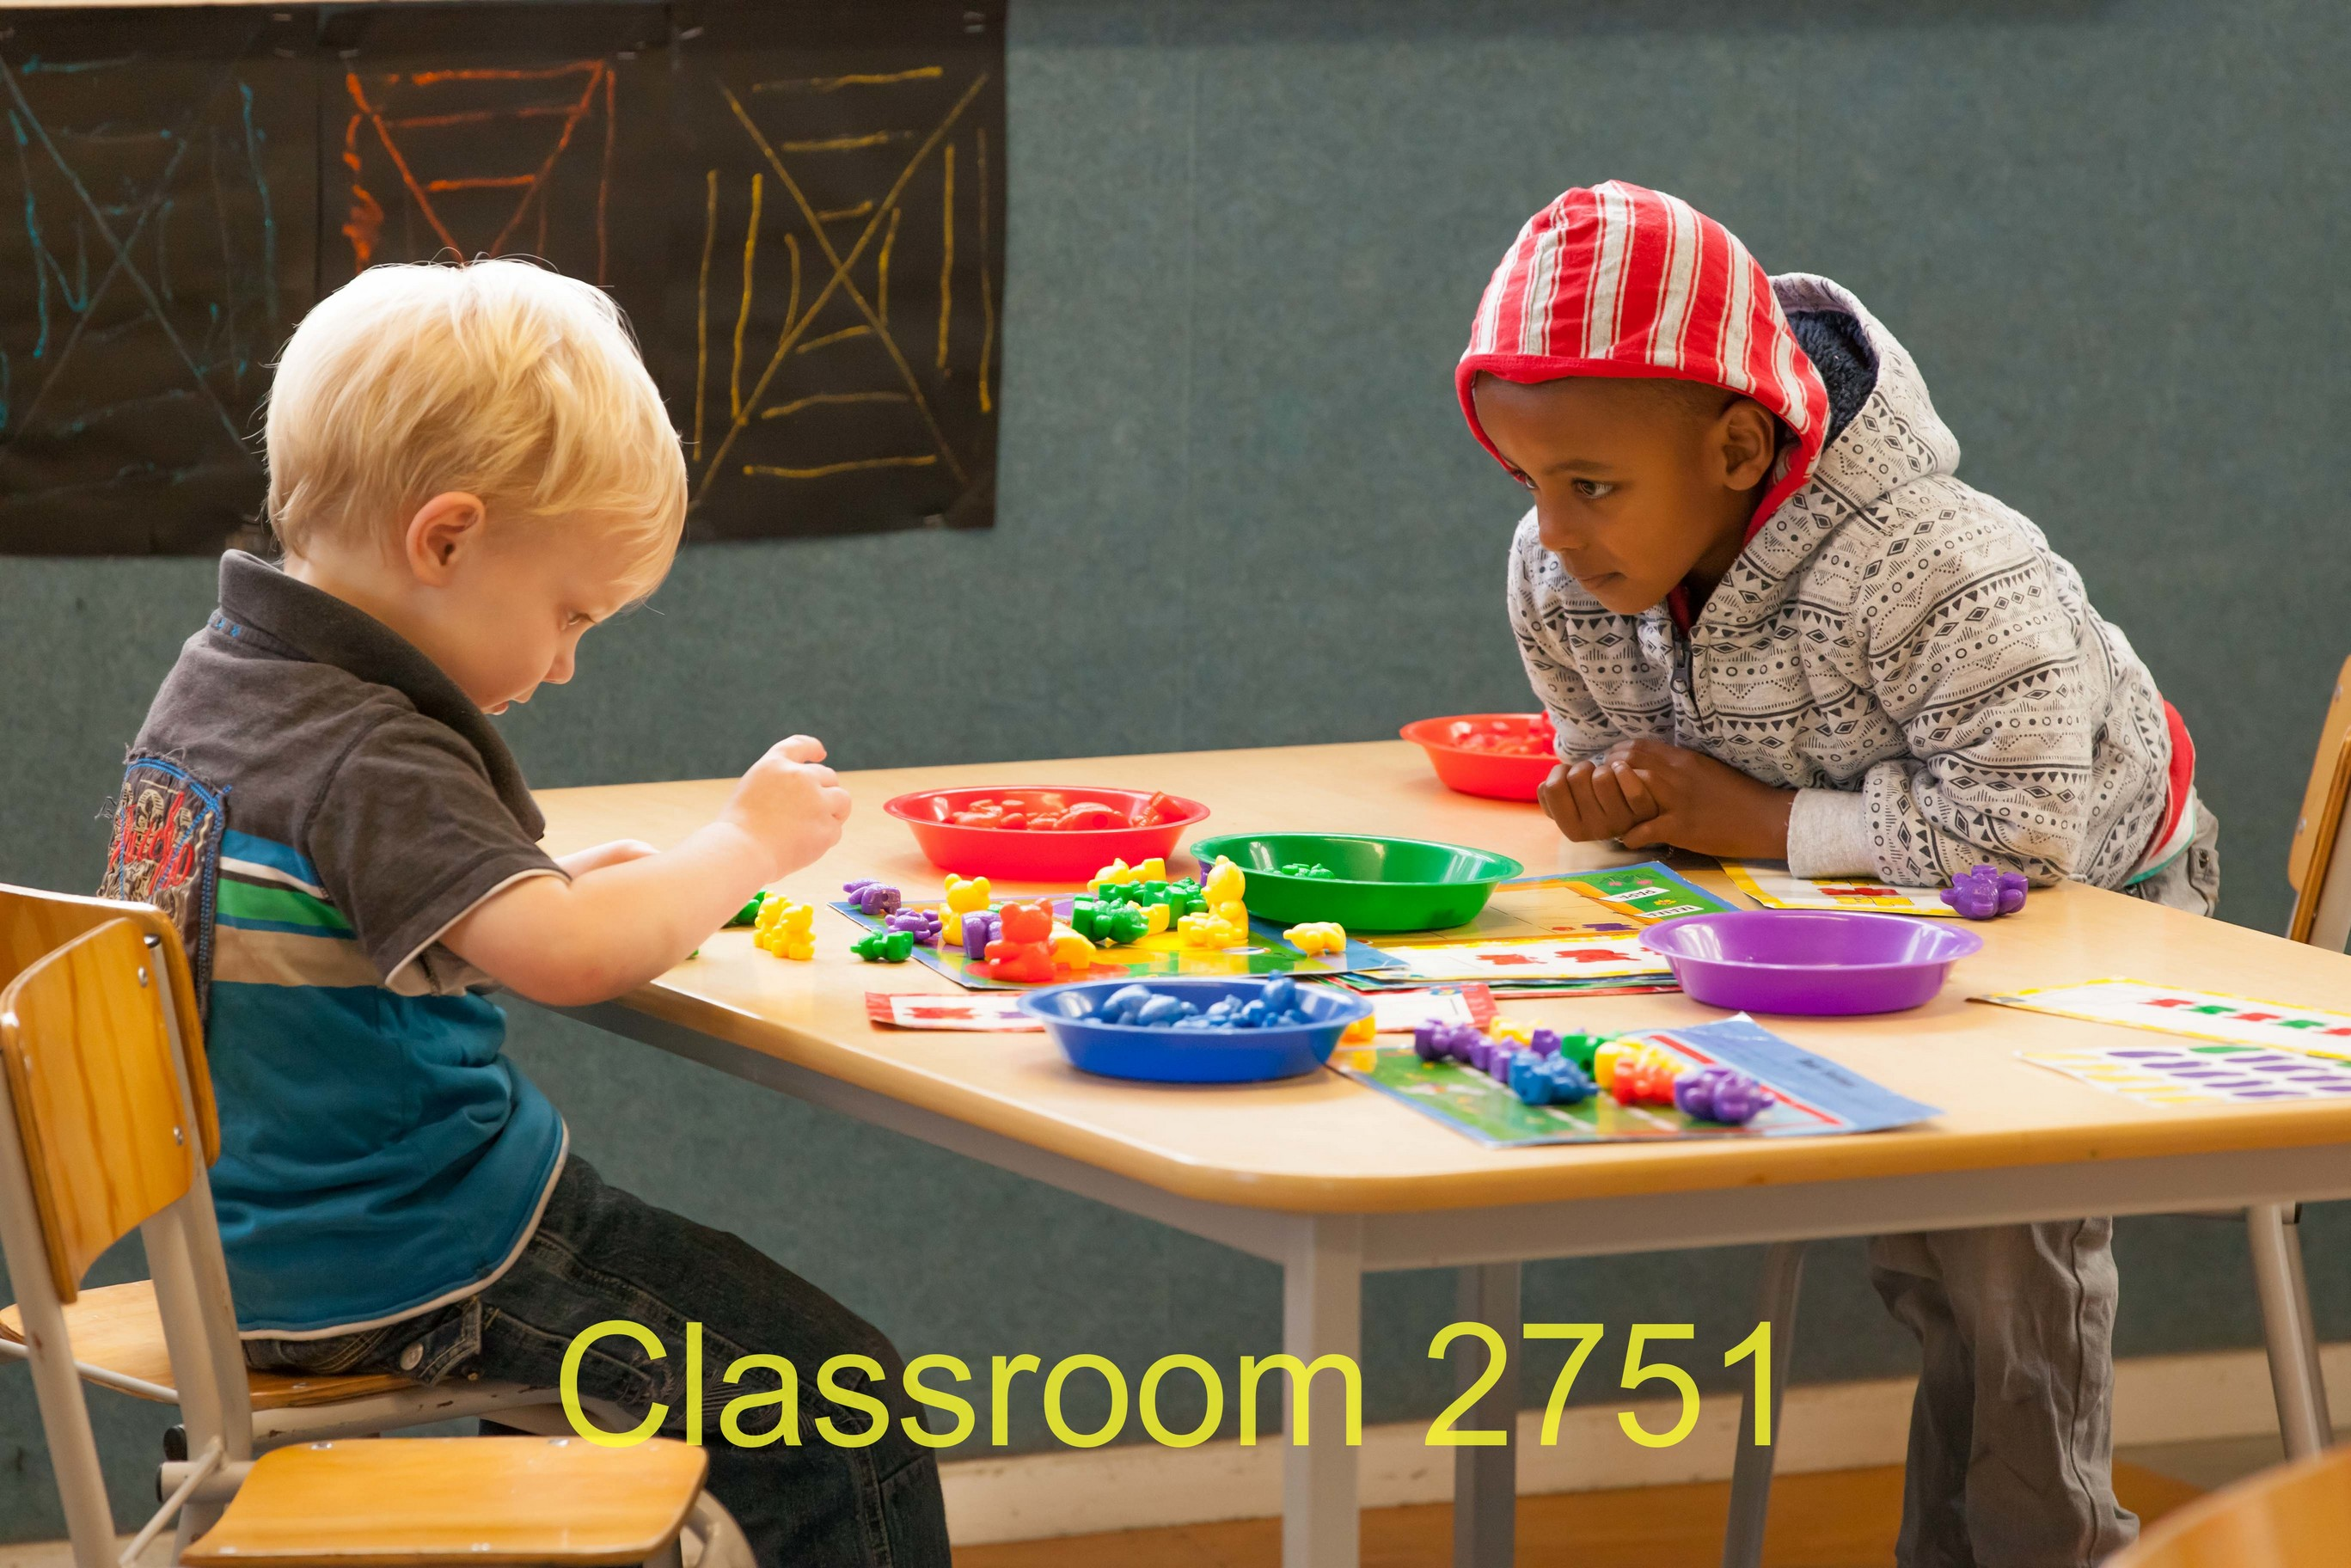 Classroom 2751